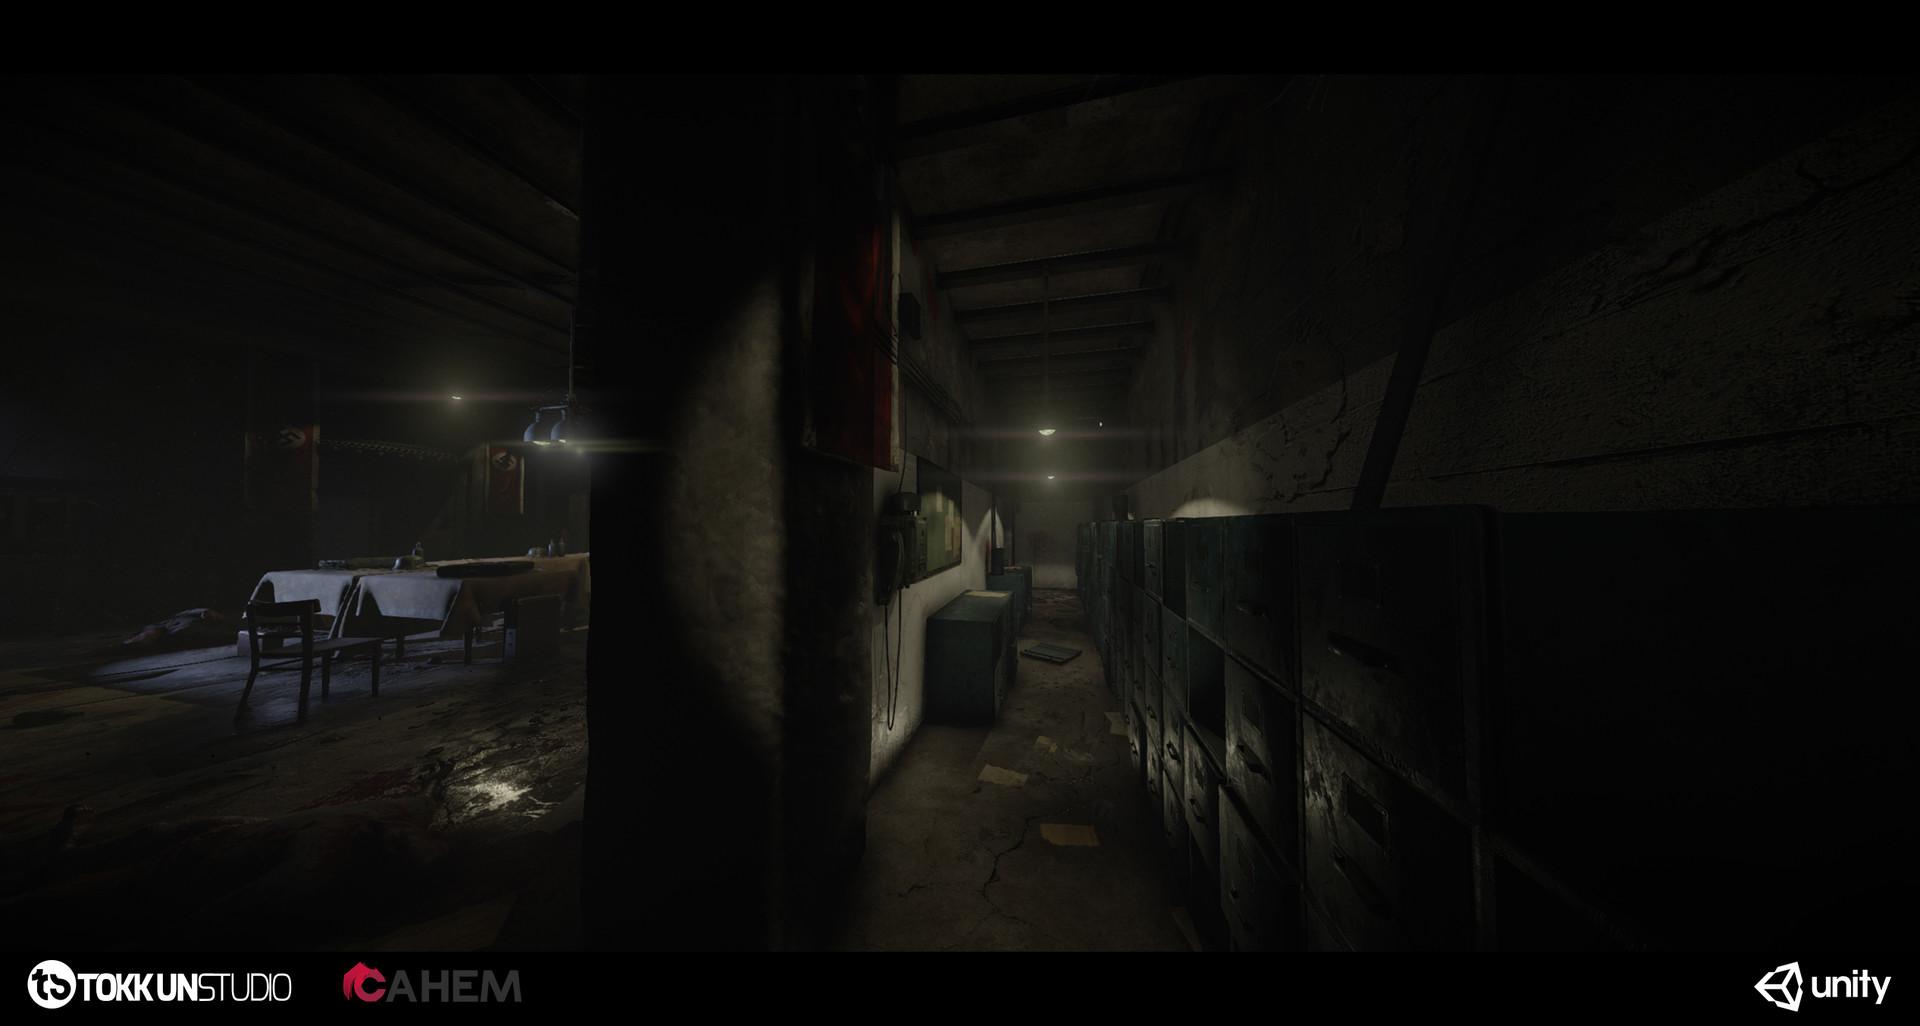 Tokkun studio bunker shot 41